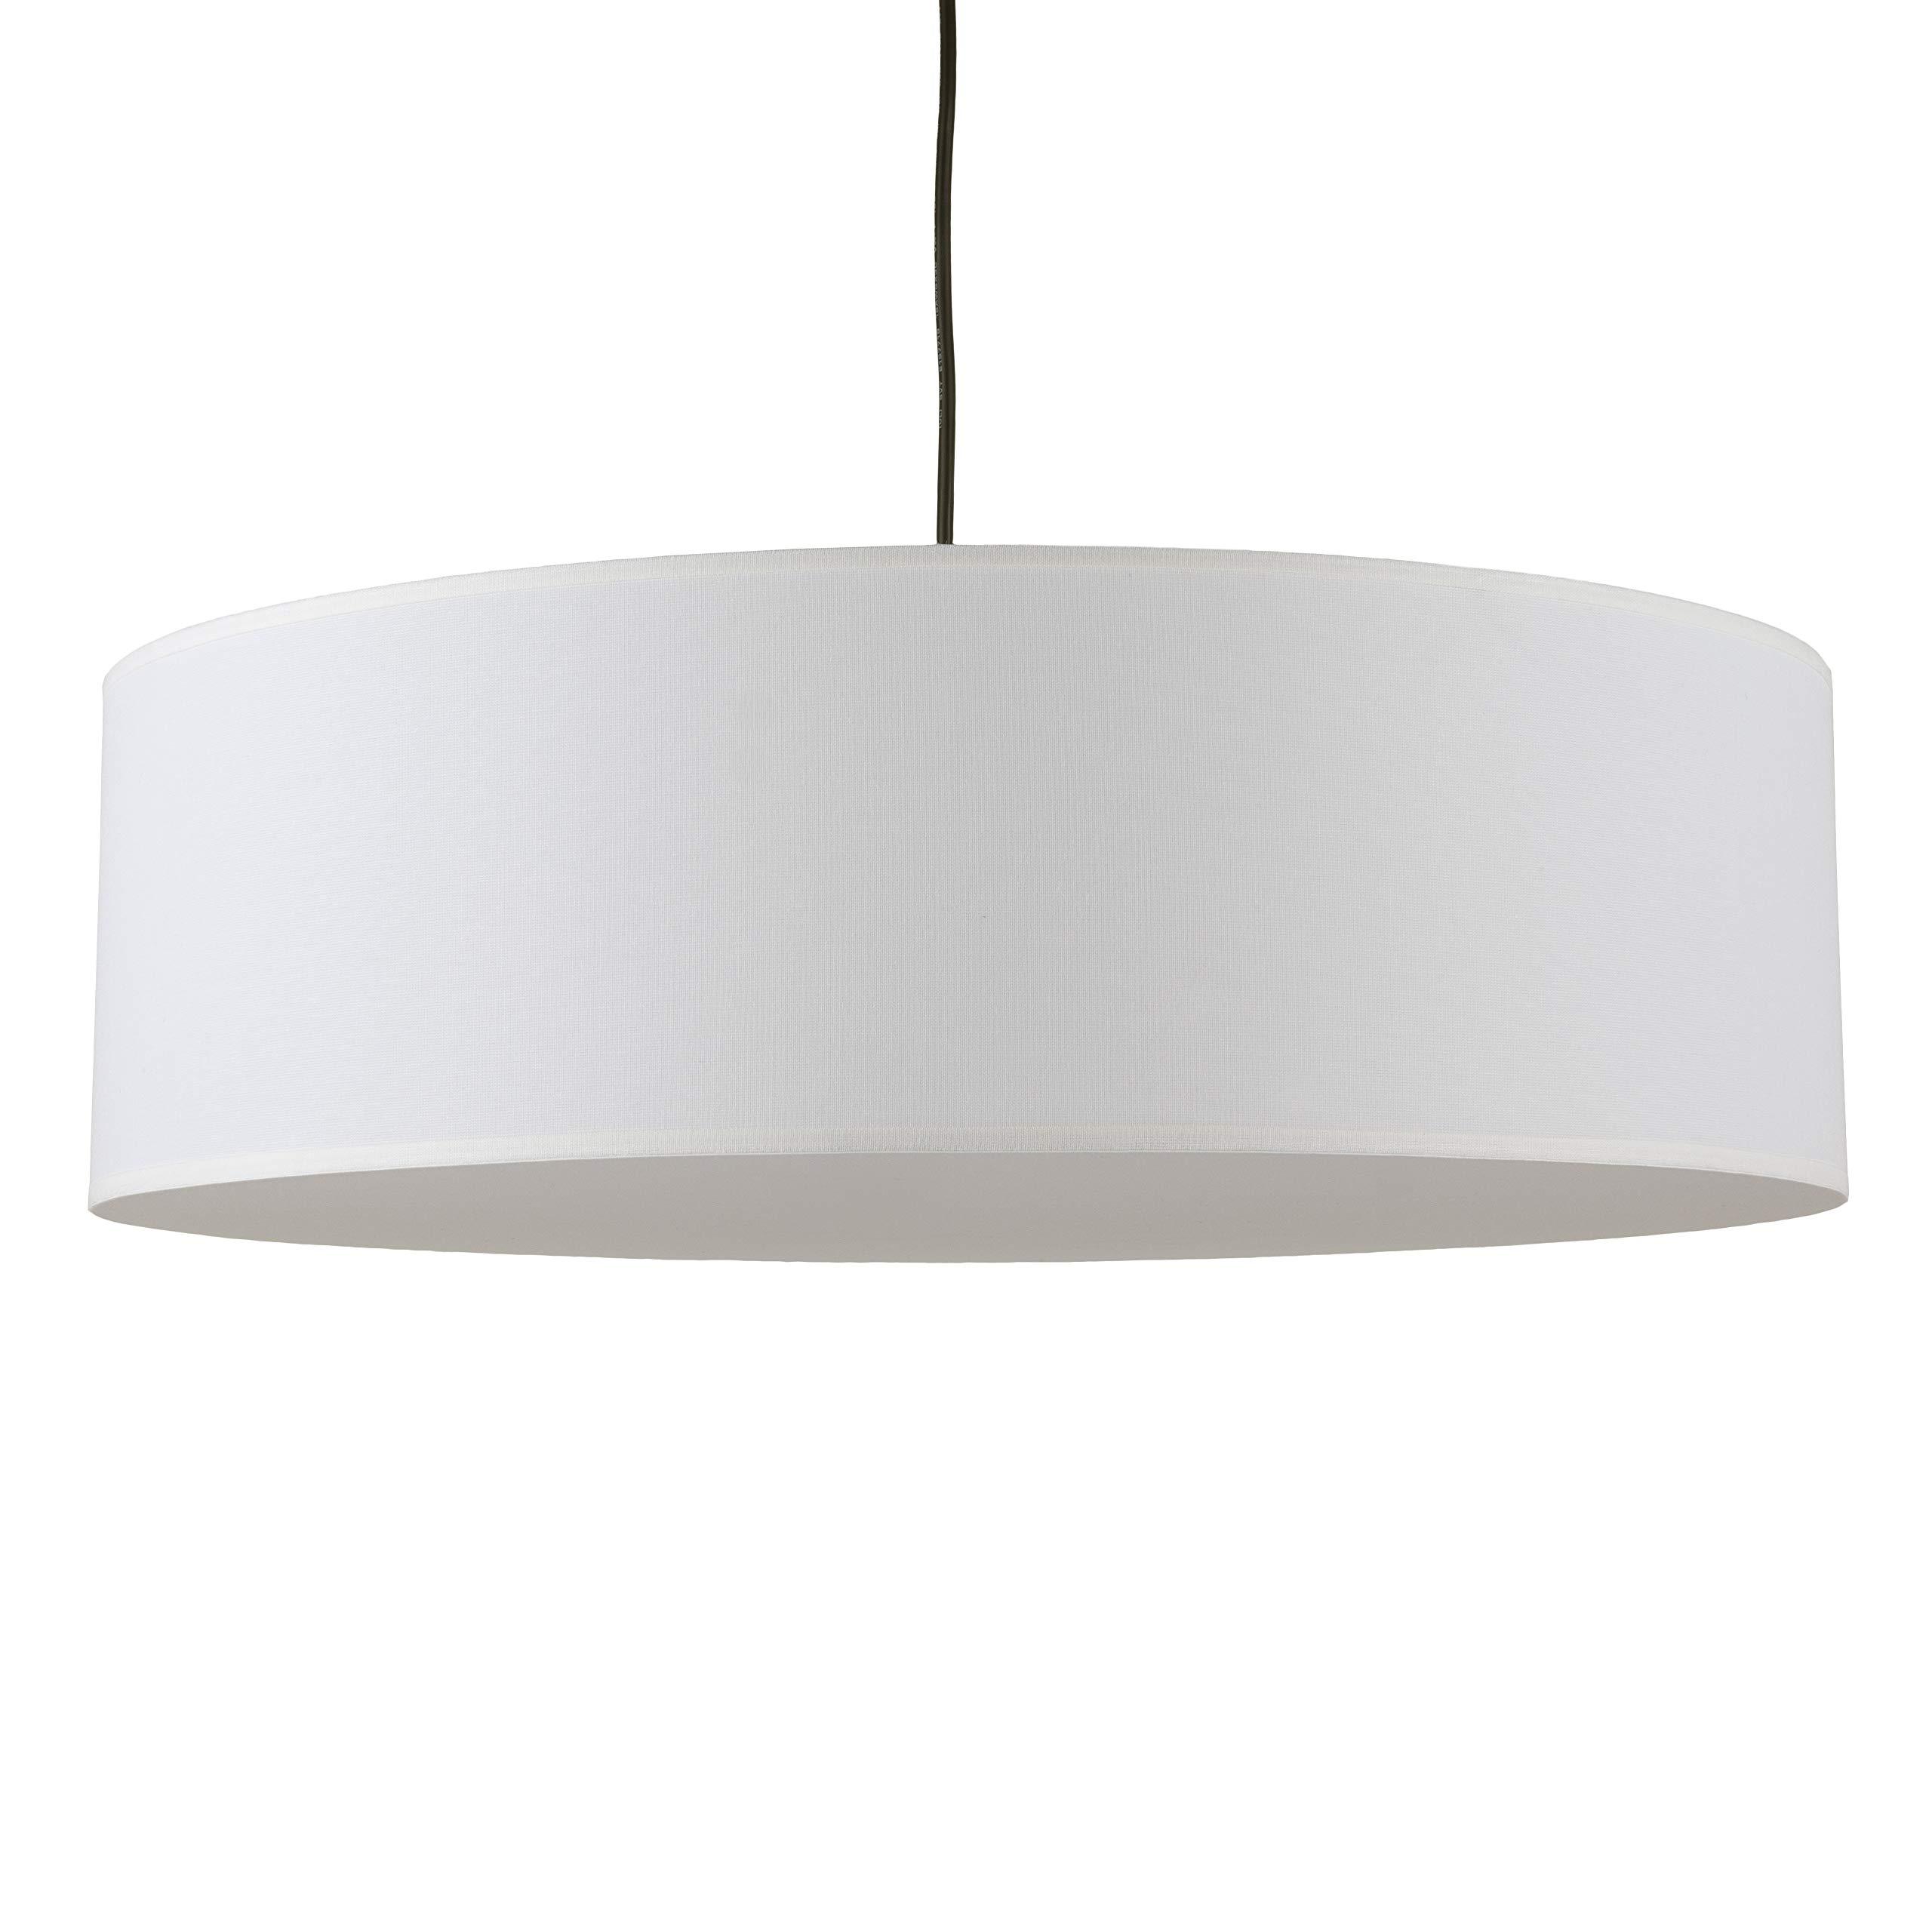 Lights Up! 9230BN-WHT Meridian Jumbo 30 Pendant, Brushed Nickel